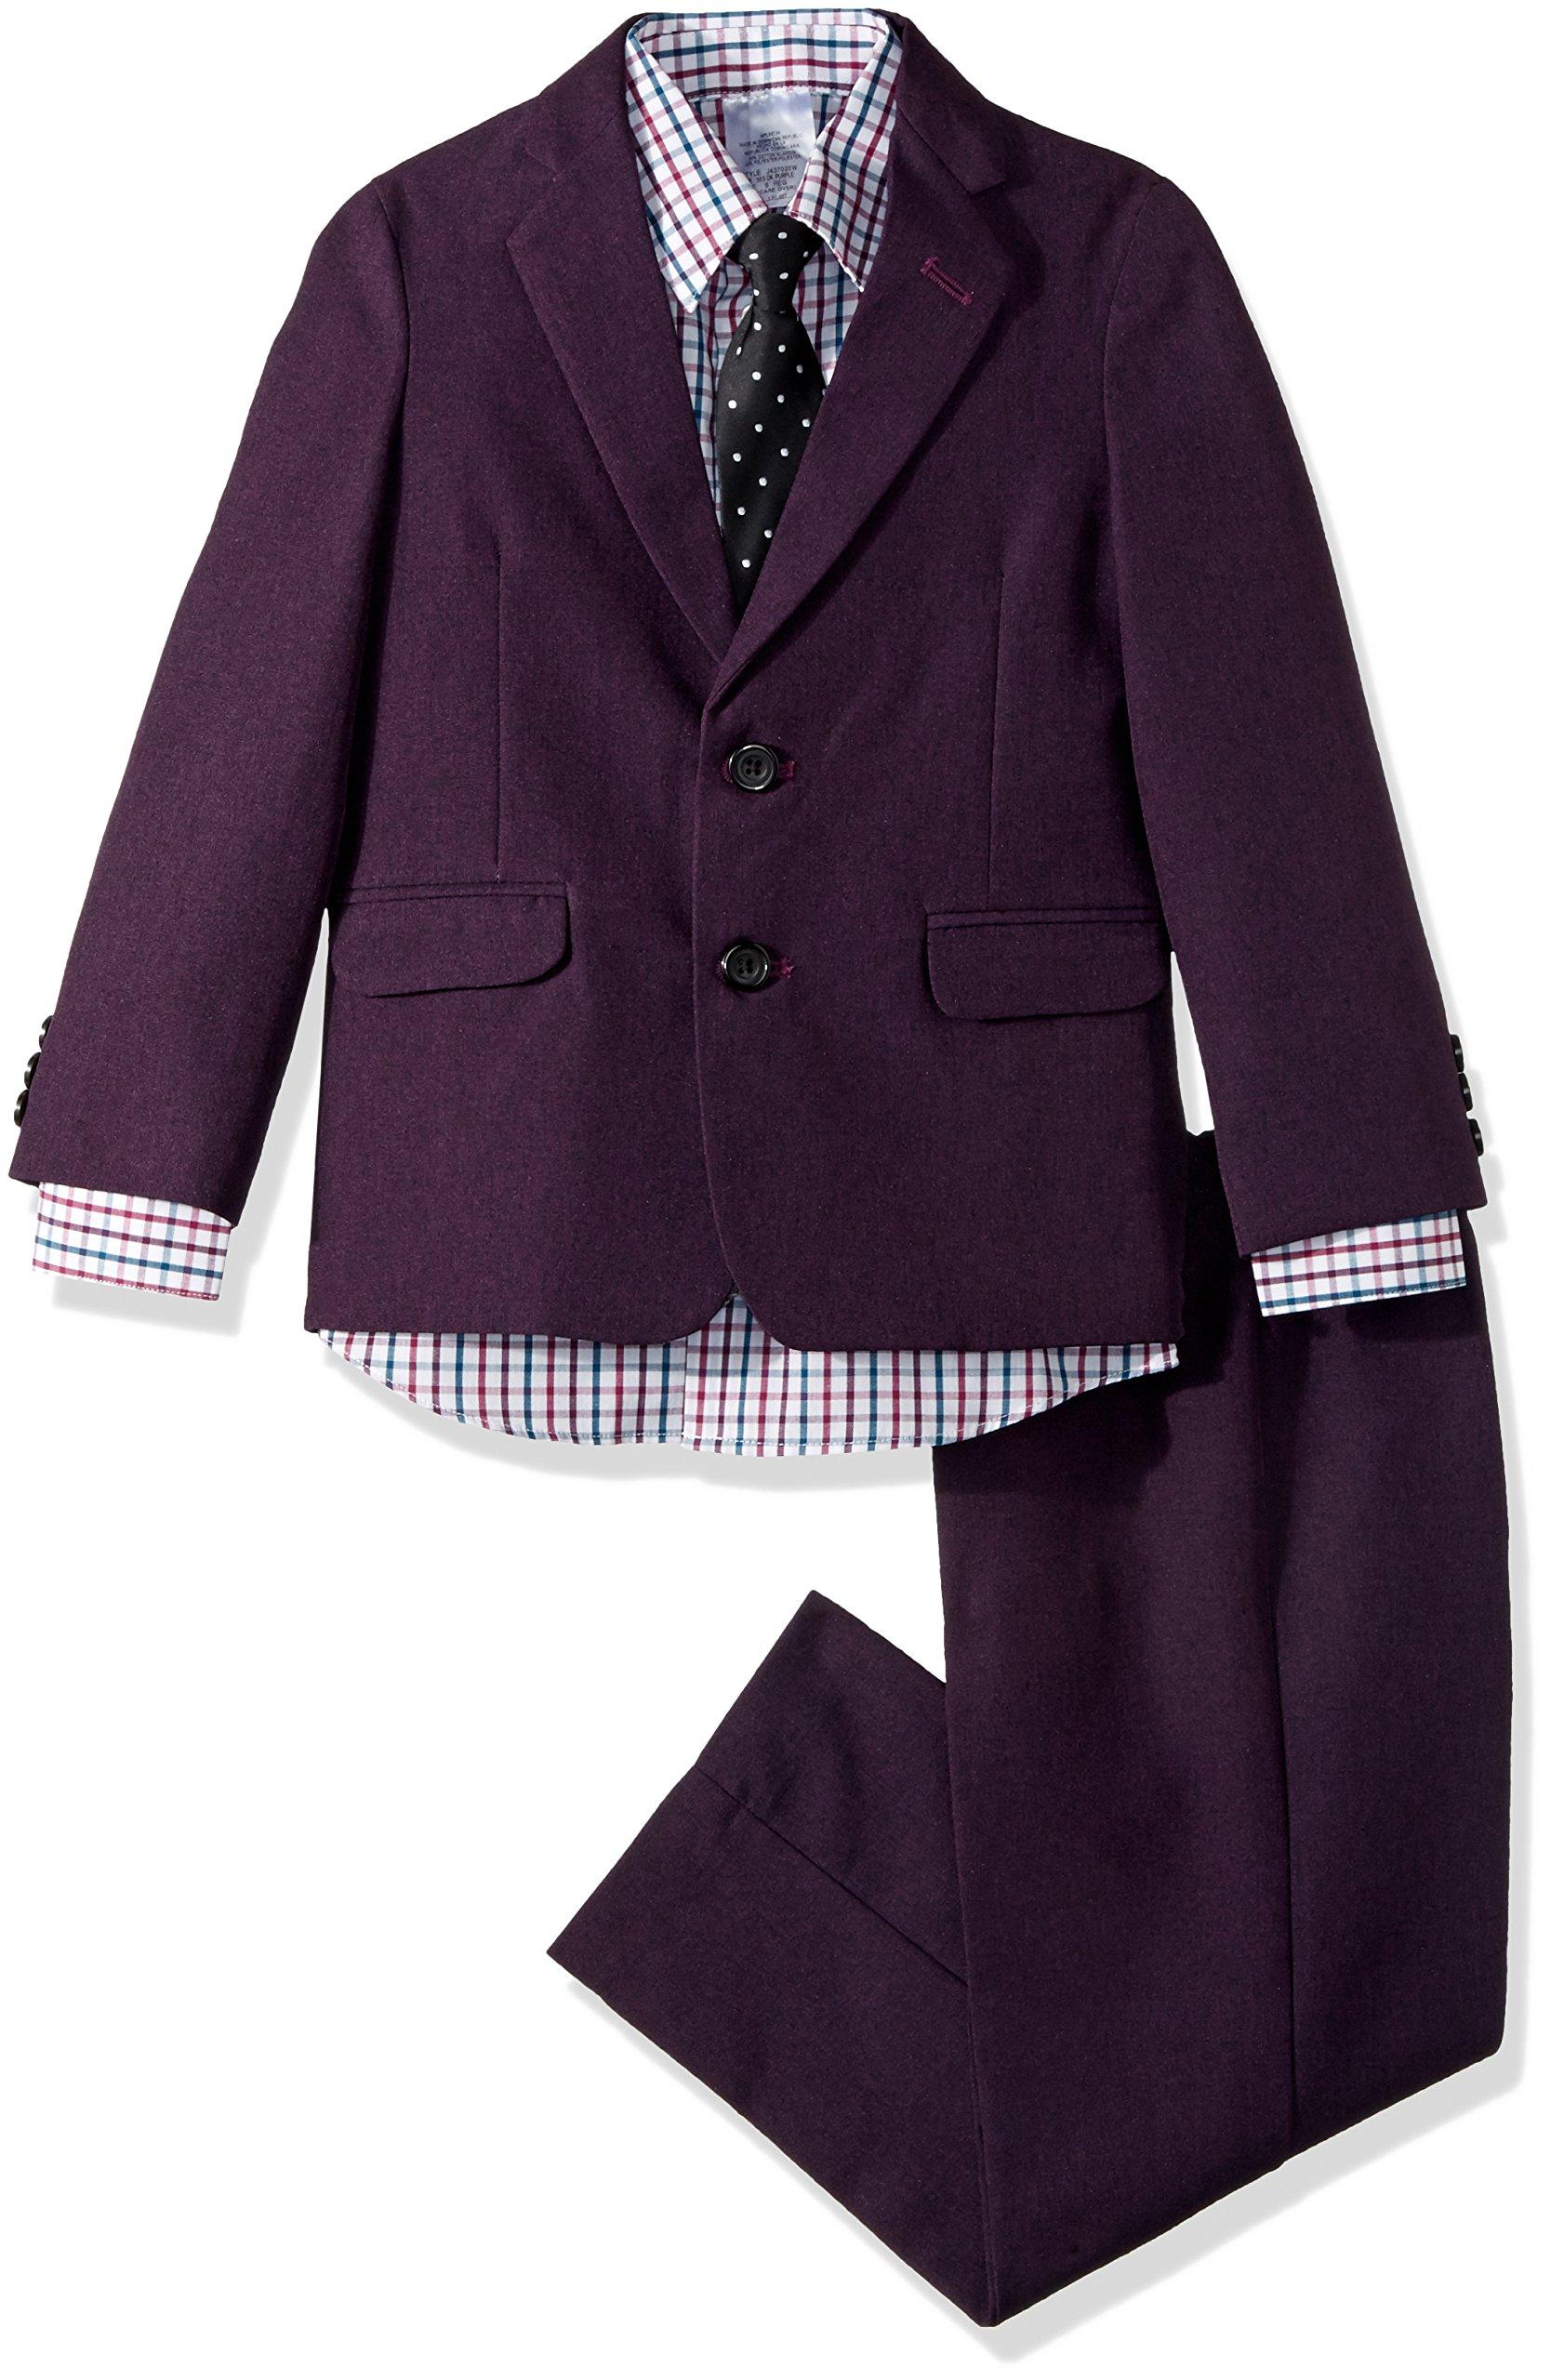 Steve Harvey Little Boys' Five Piece Suit Set, Dark Purple, 5 by Steve Harvey